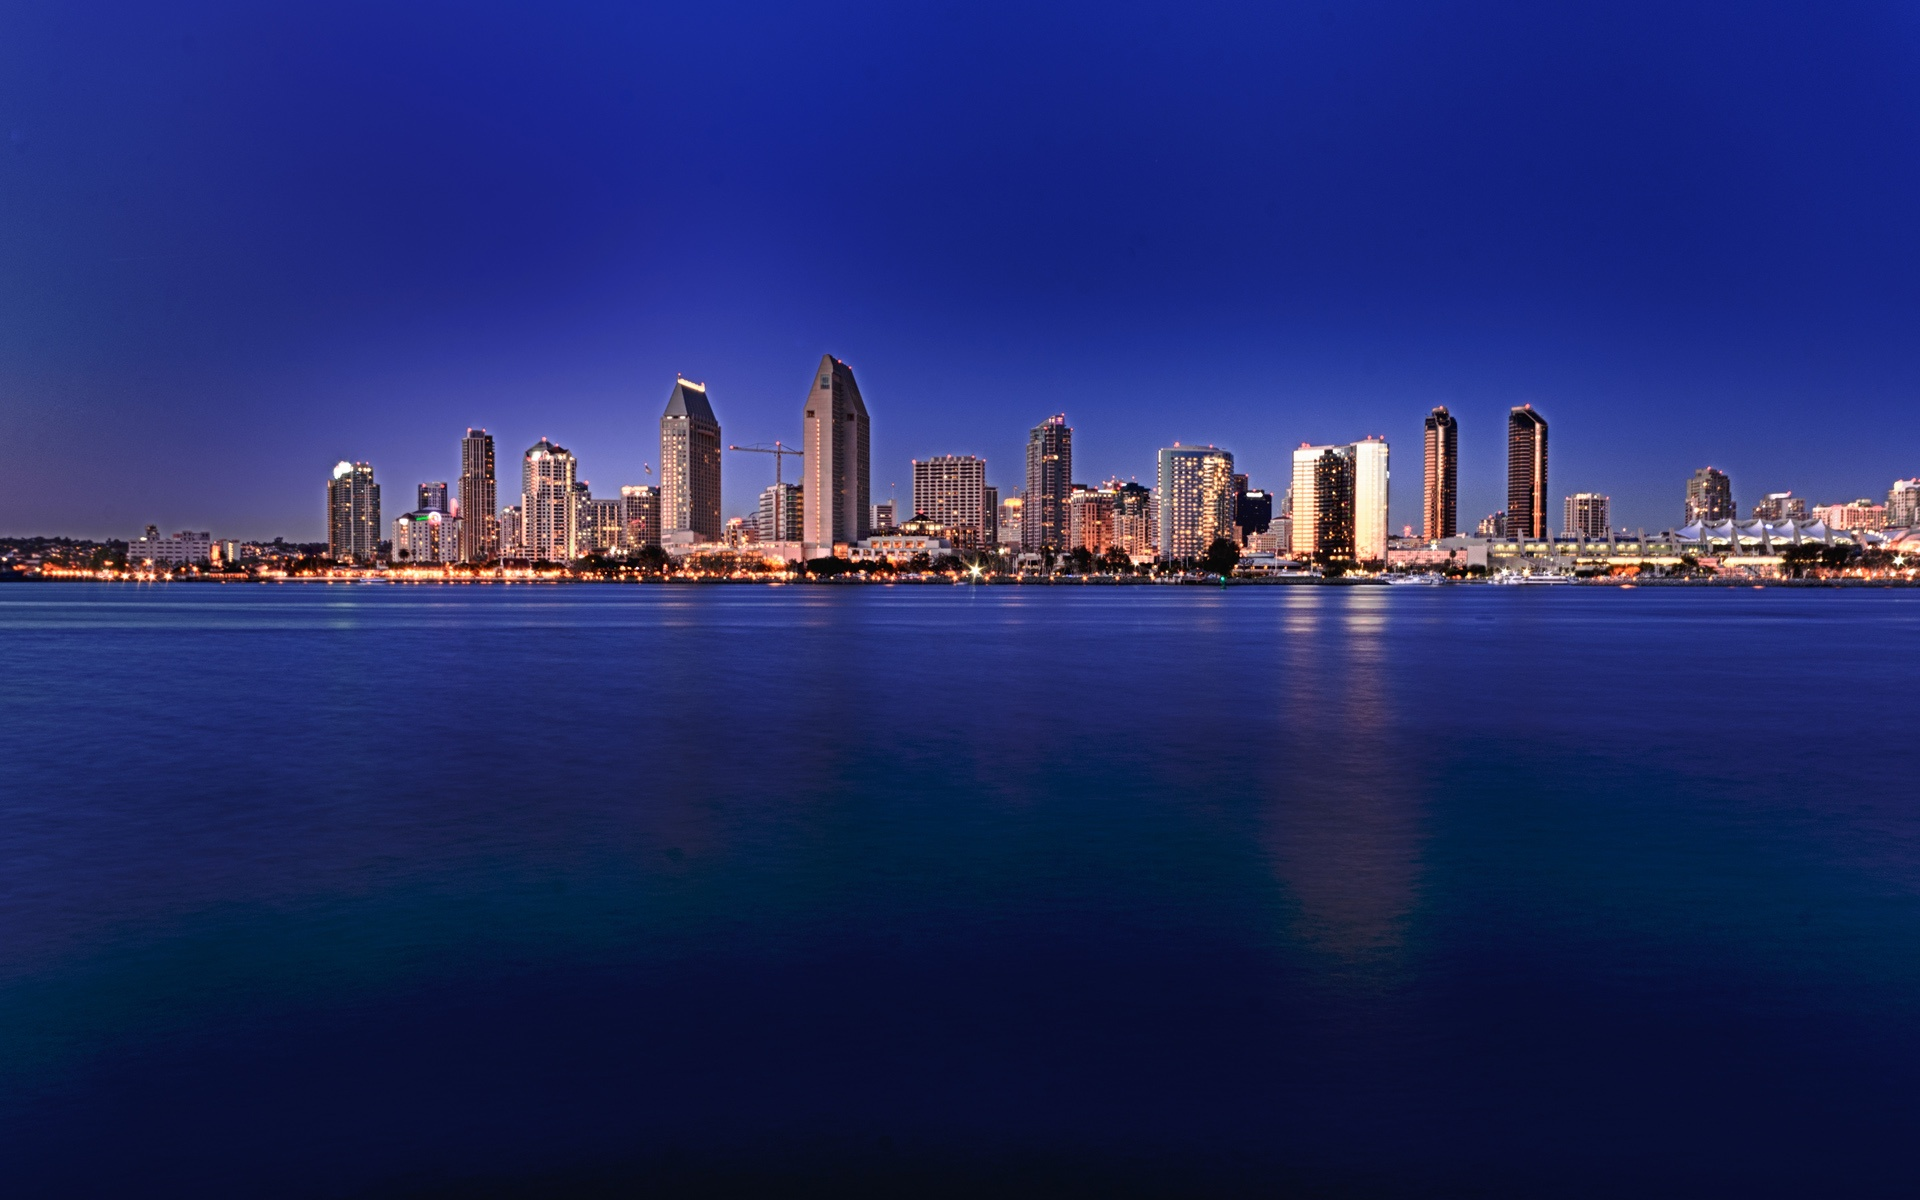 San Diego wallpaper 171603 1920x1200